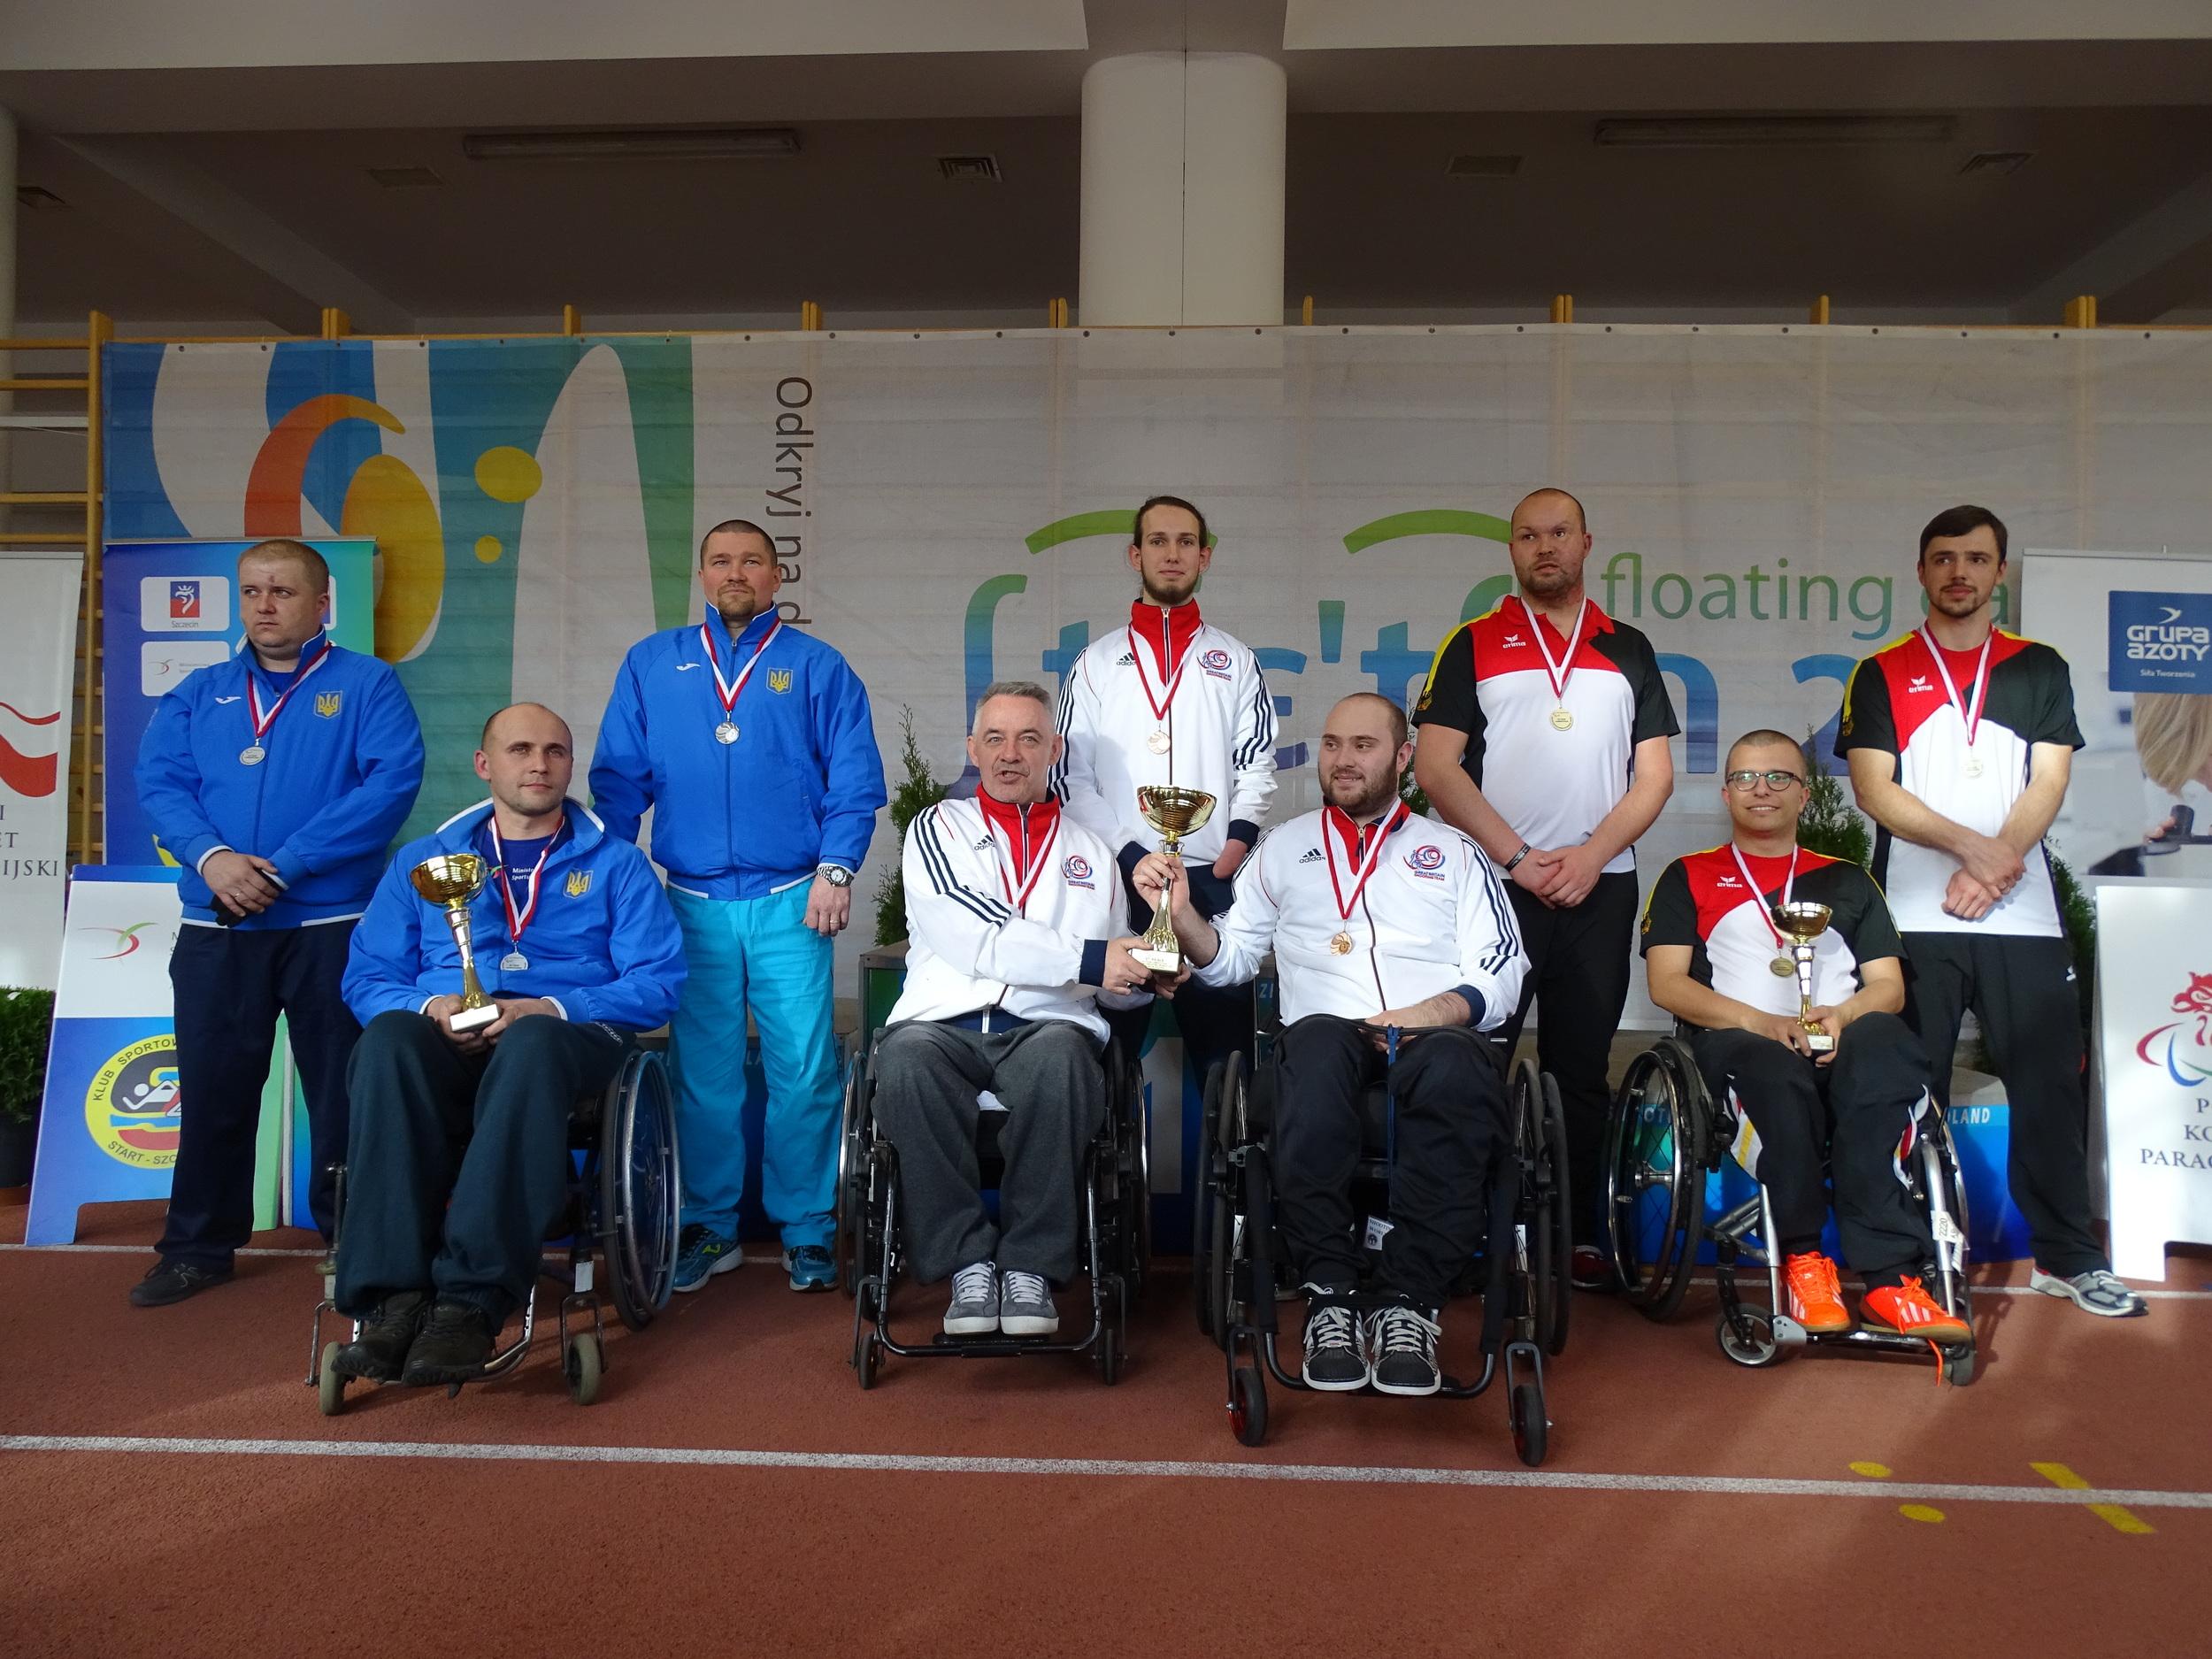 R4 Team Gold medallists